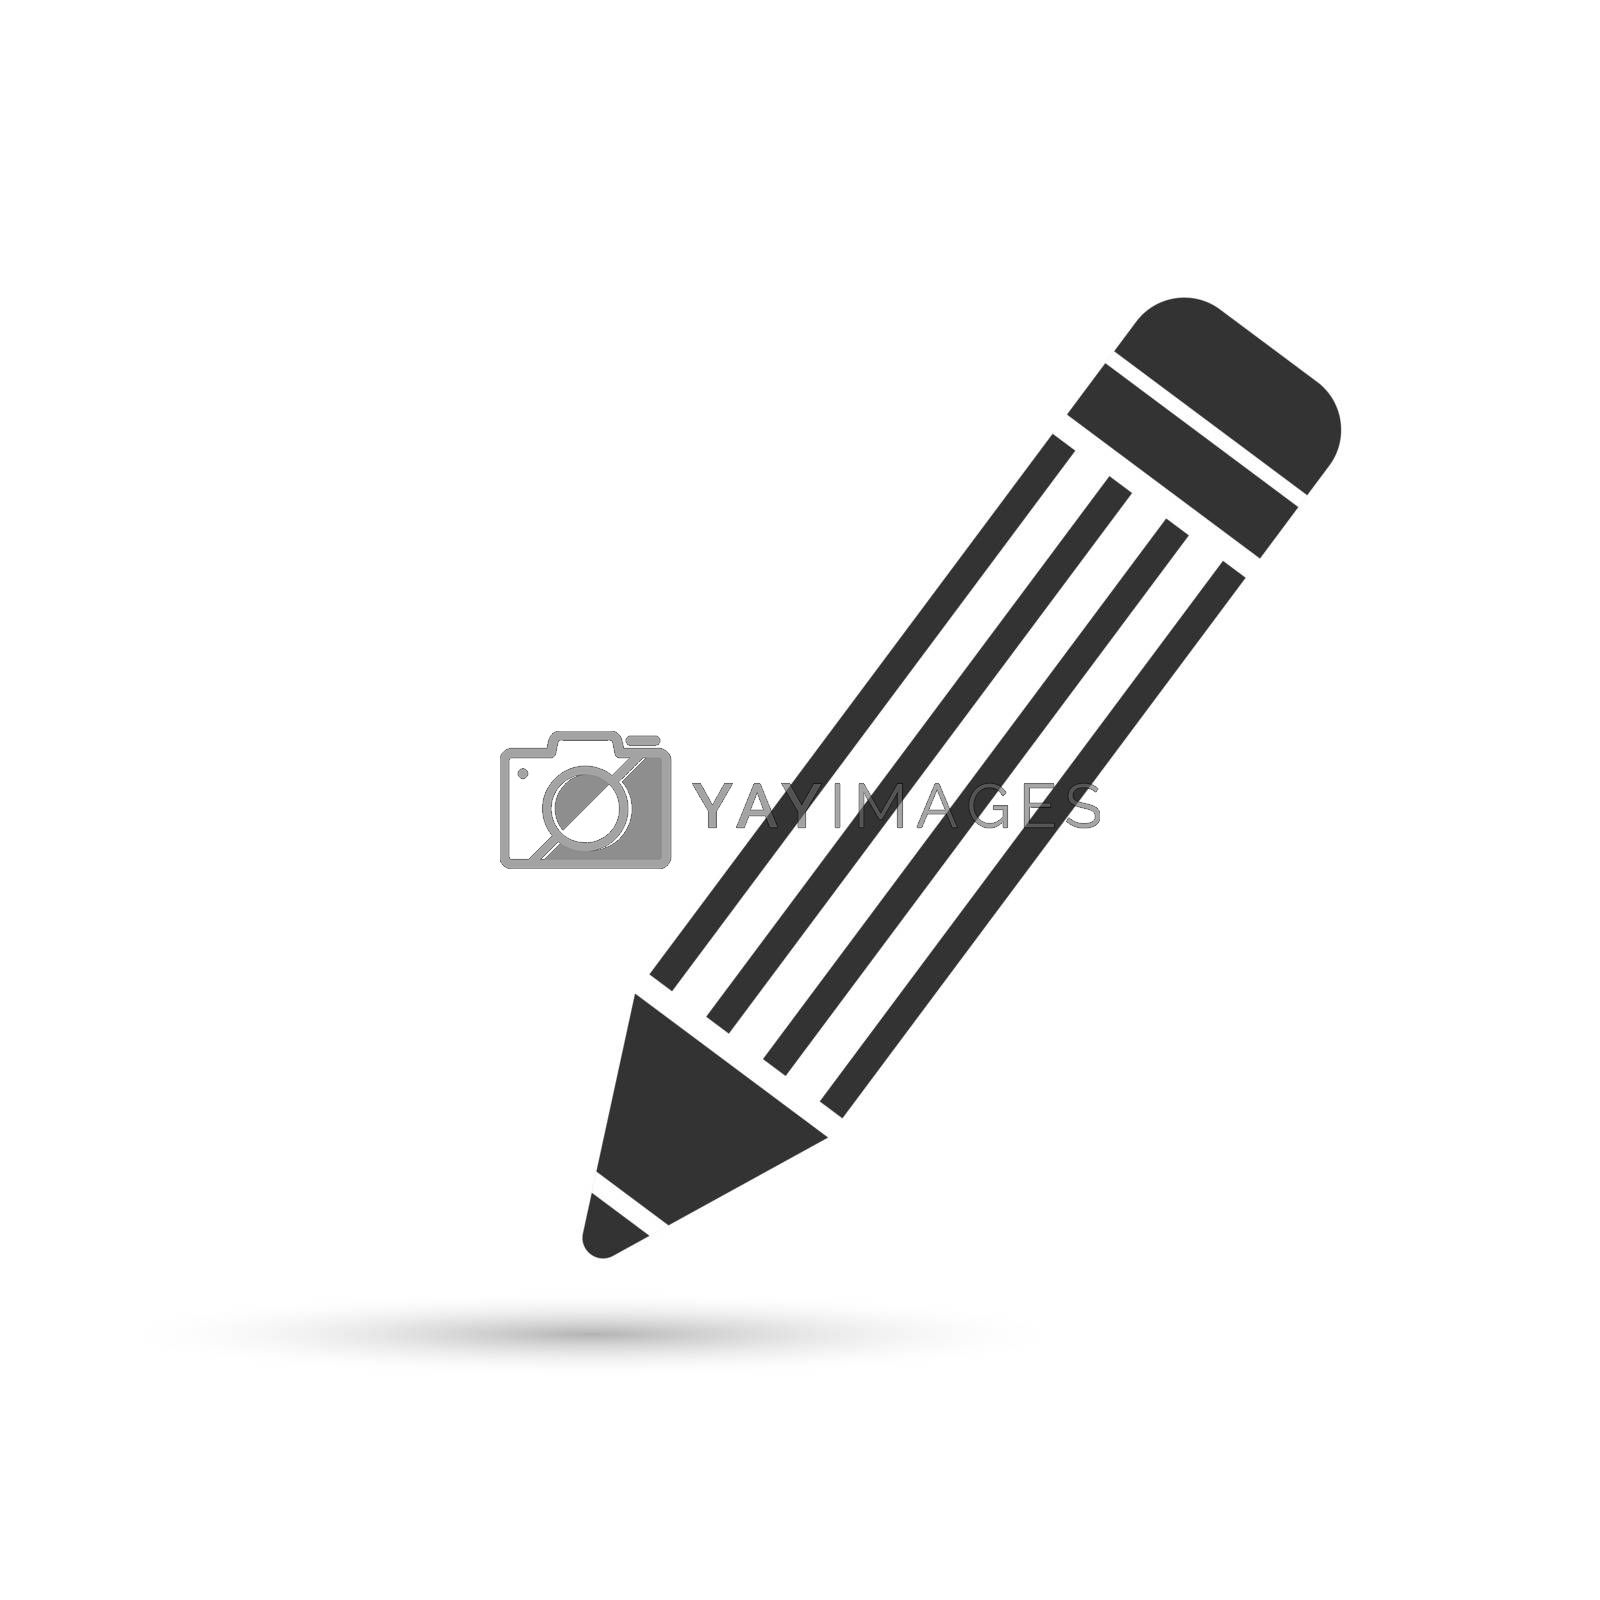 Pencil icon with eraser, flat simple design.